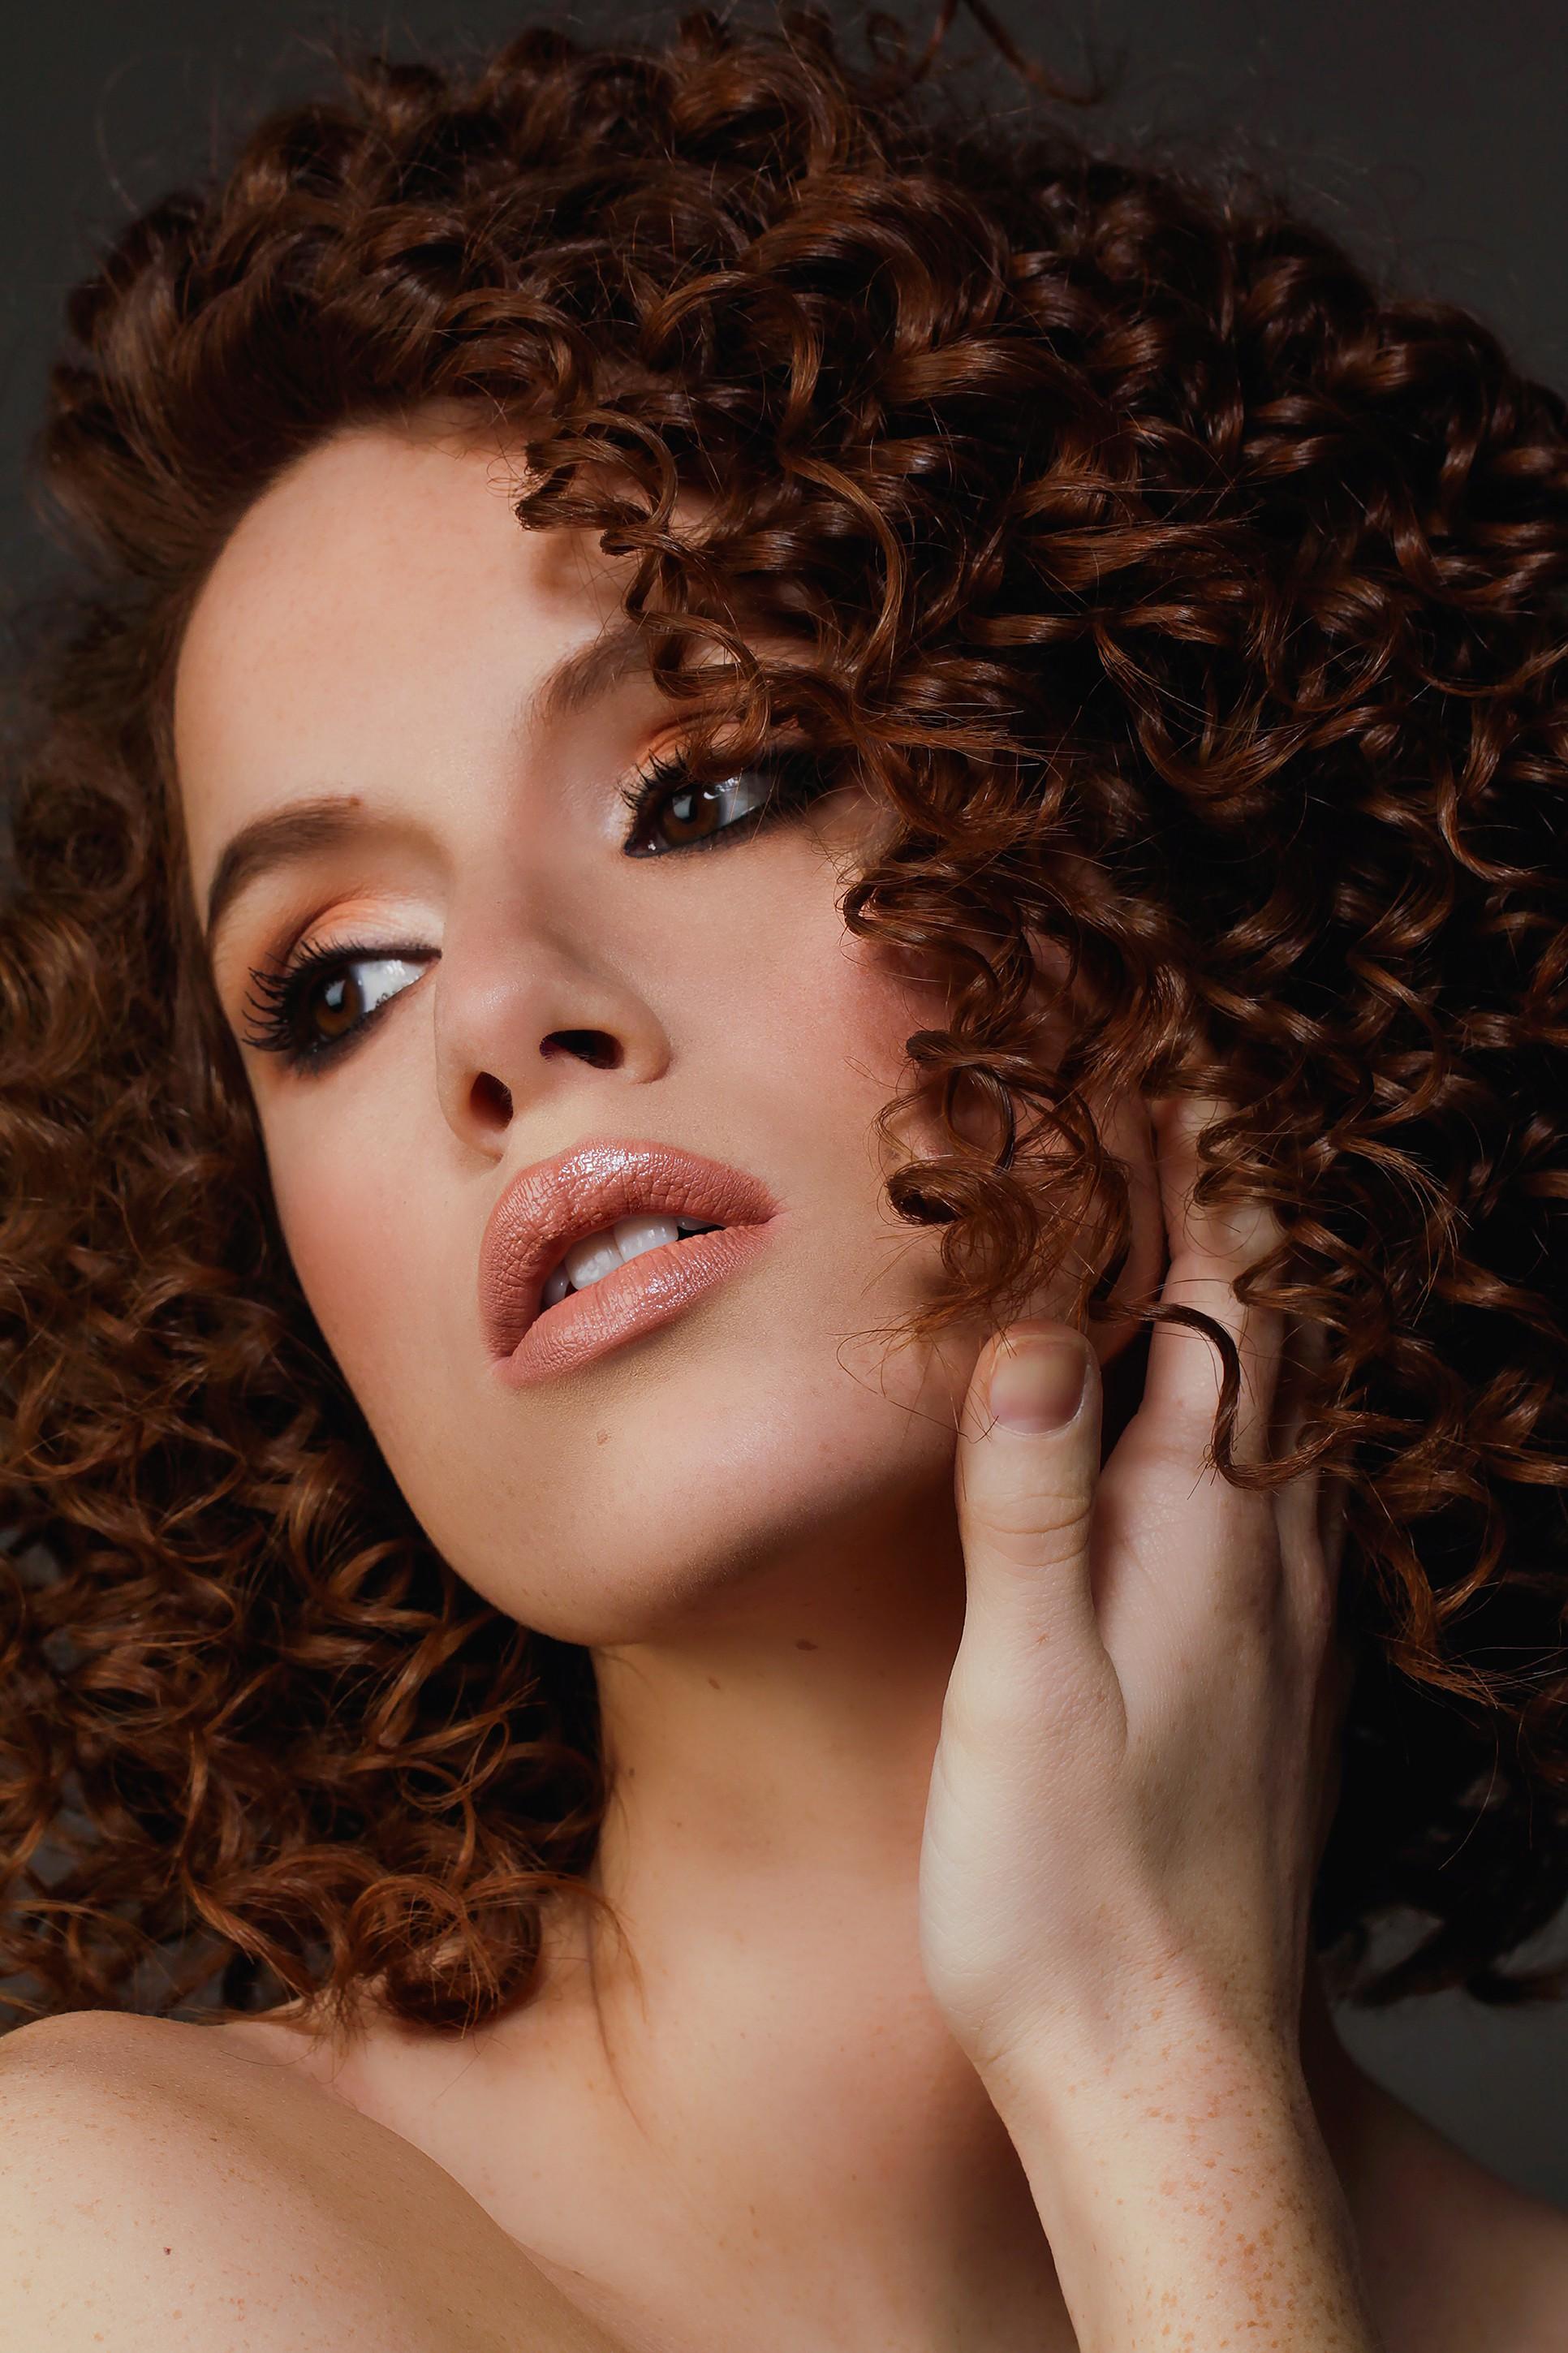 New curly haired model photoshoot. Makeup artist Near me Nottingham Best makeup artist Caroline Kent 2017.jpg